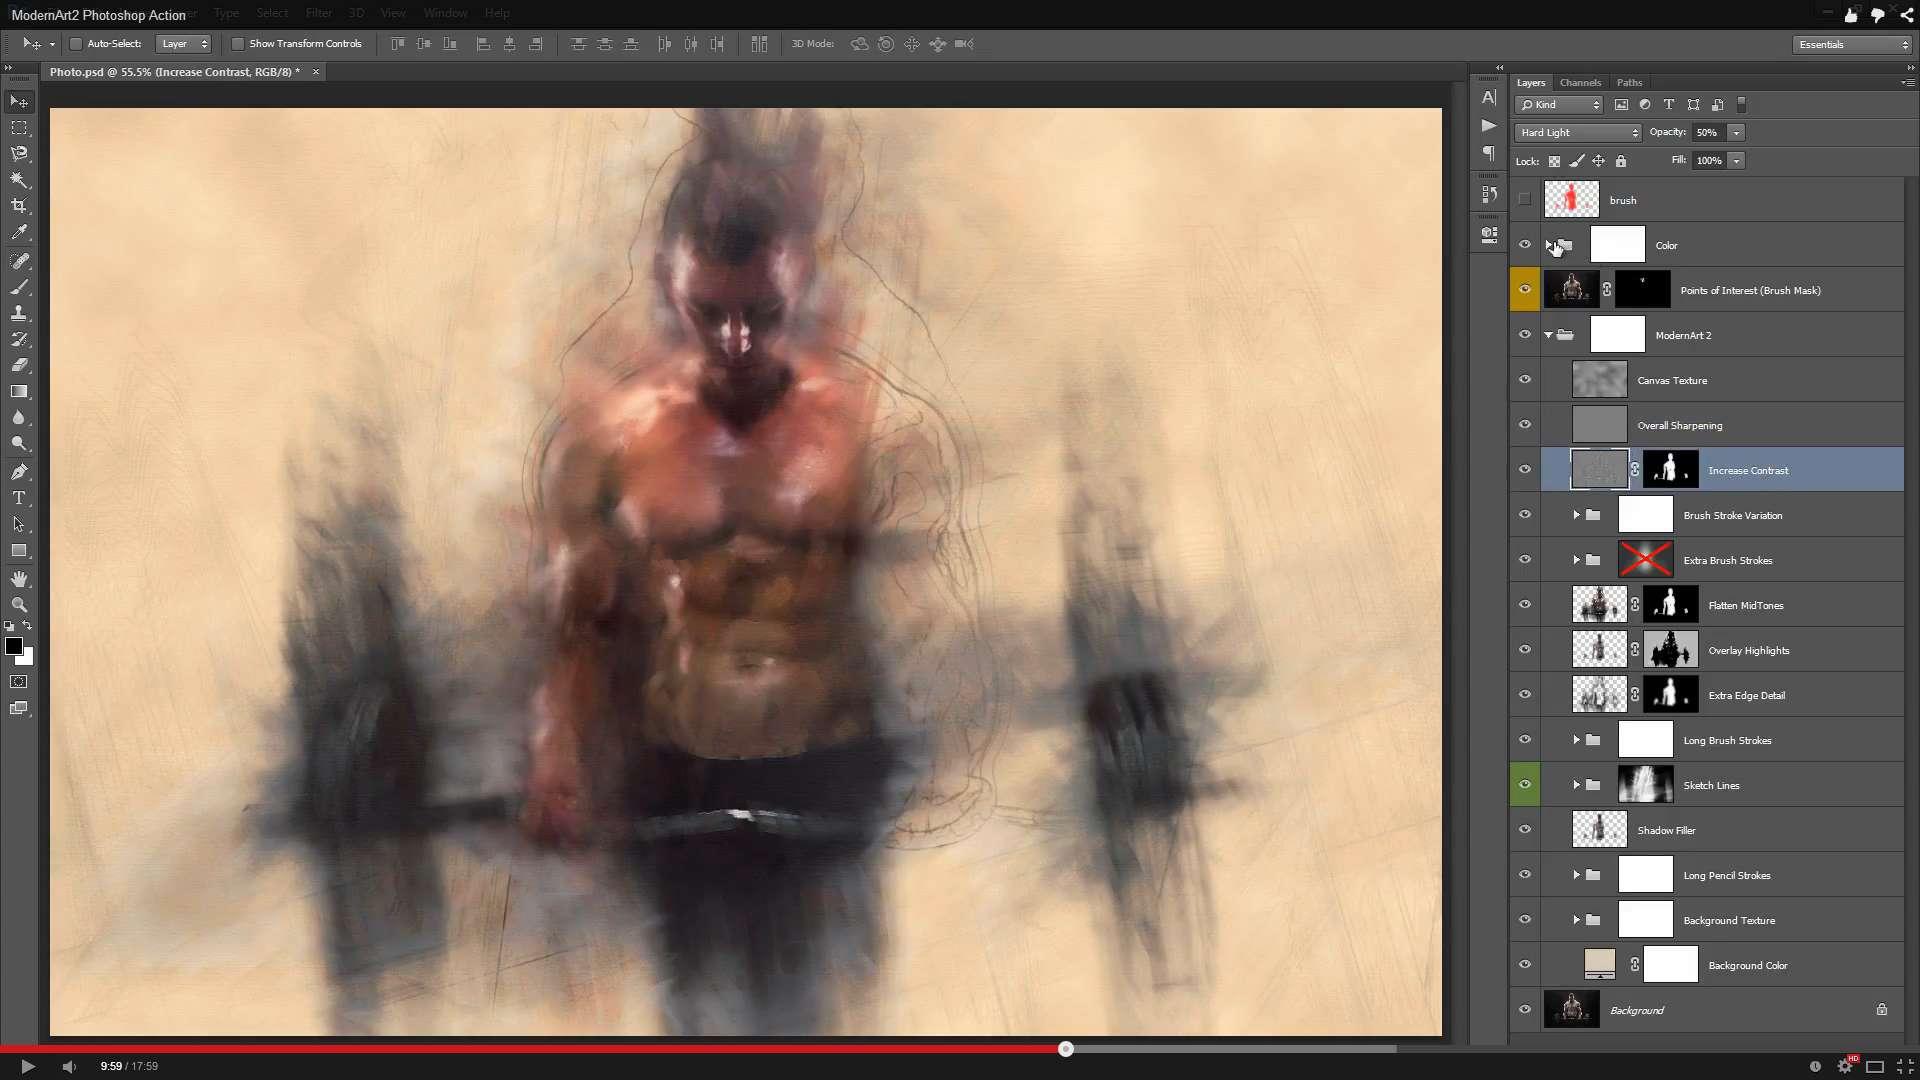 ModernArt 2 Photoshop Action – WooEnvato – Demo